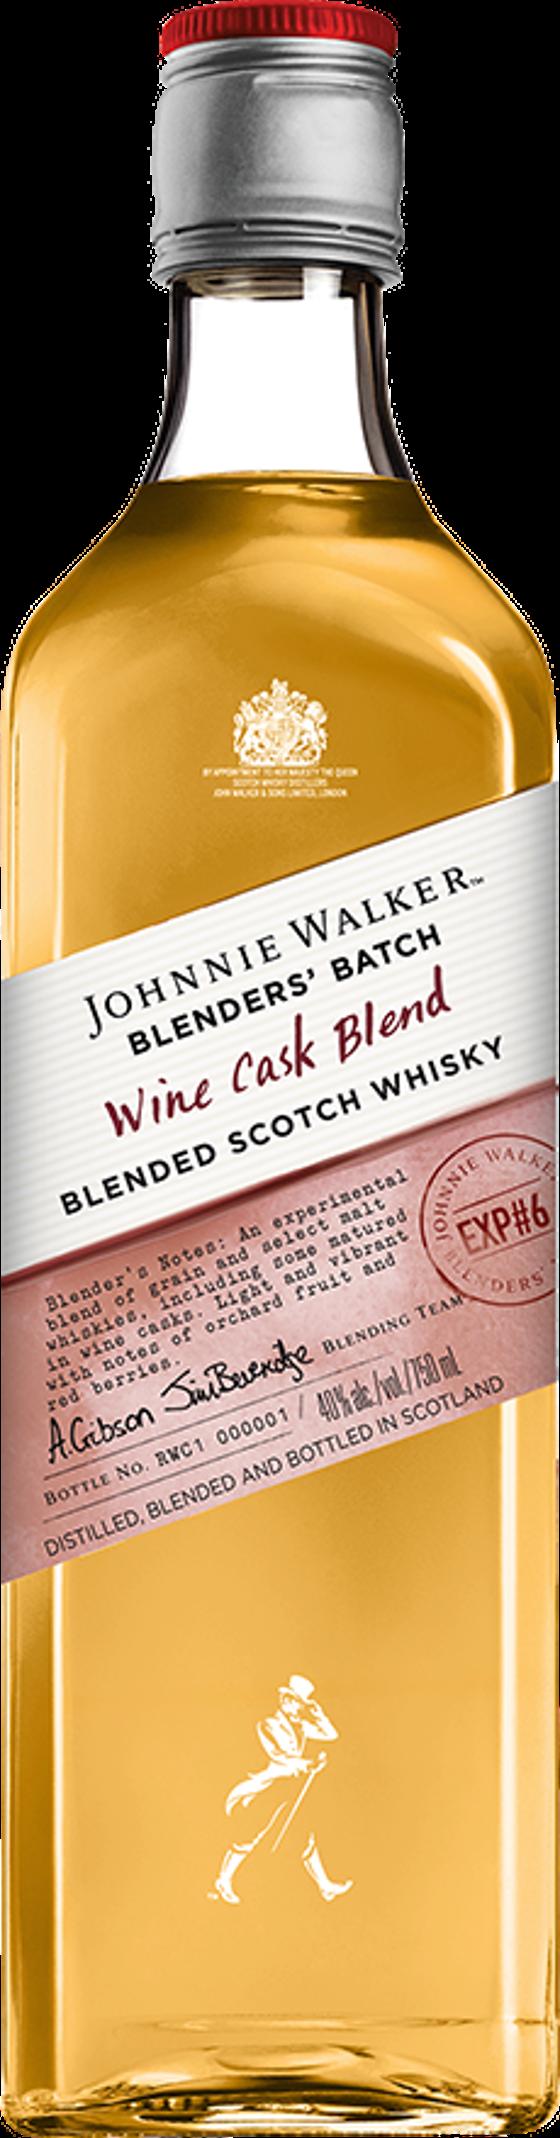 4. Johnnie Walker Wine Cask